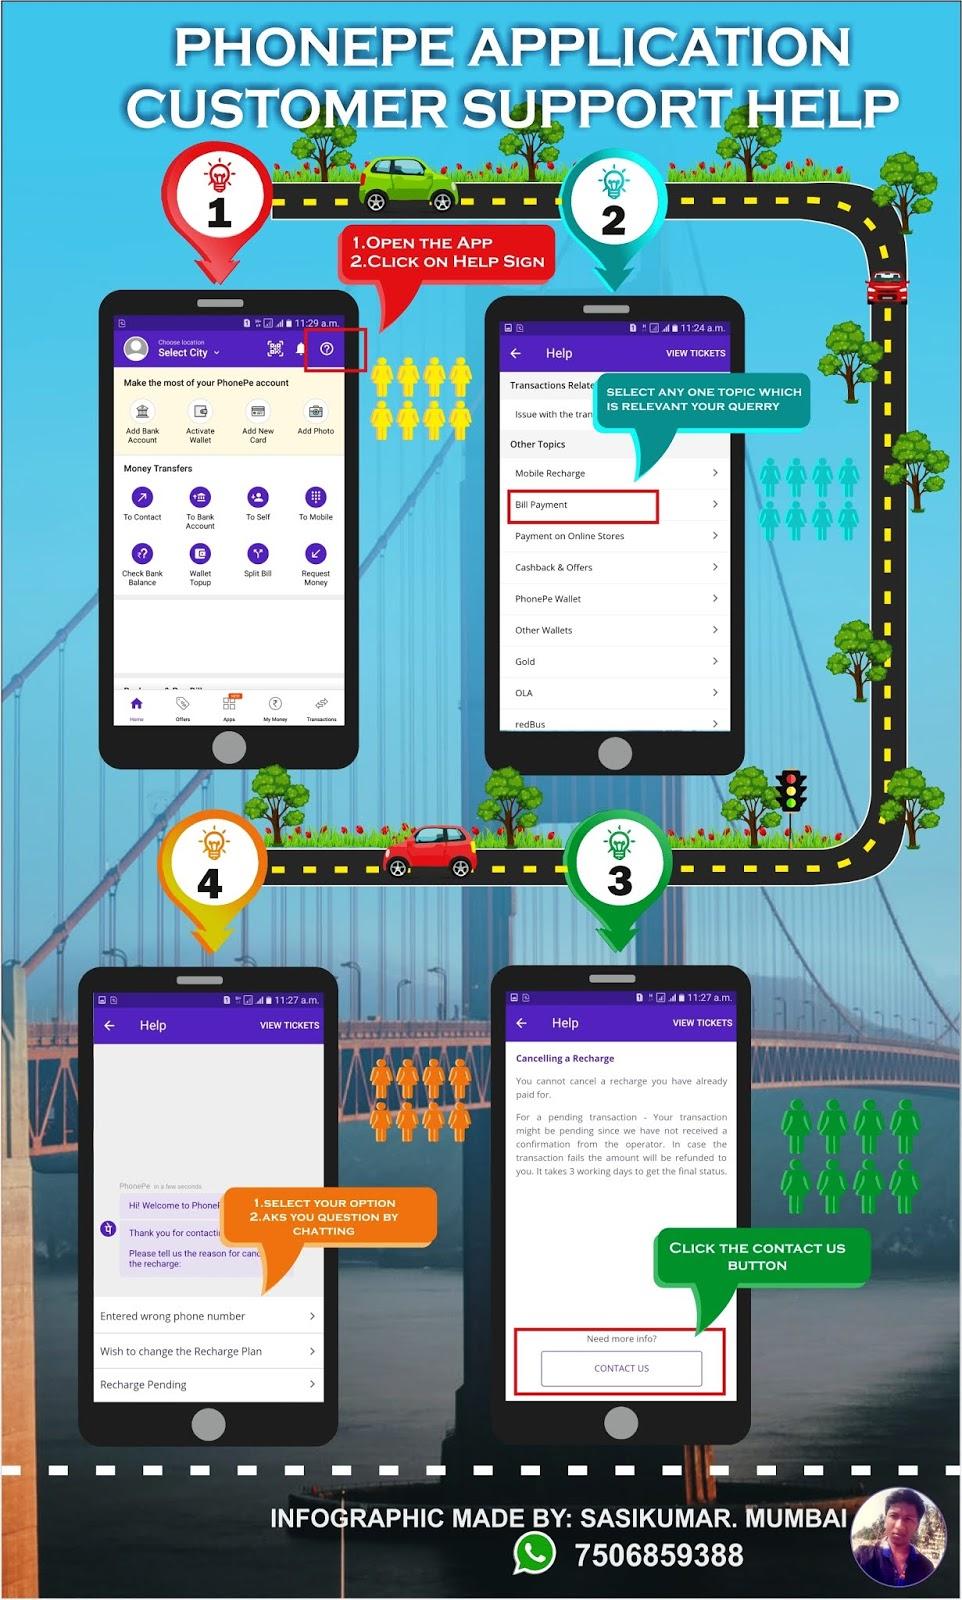 Phonepe App customer care